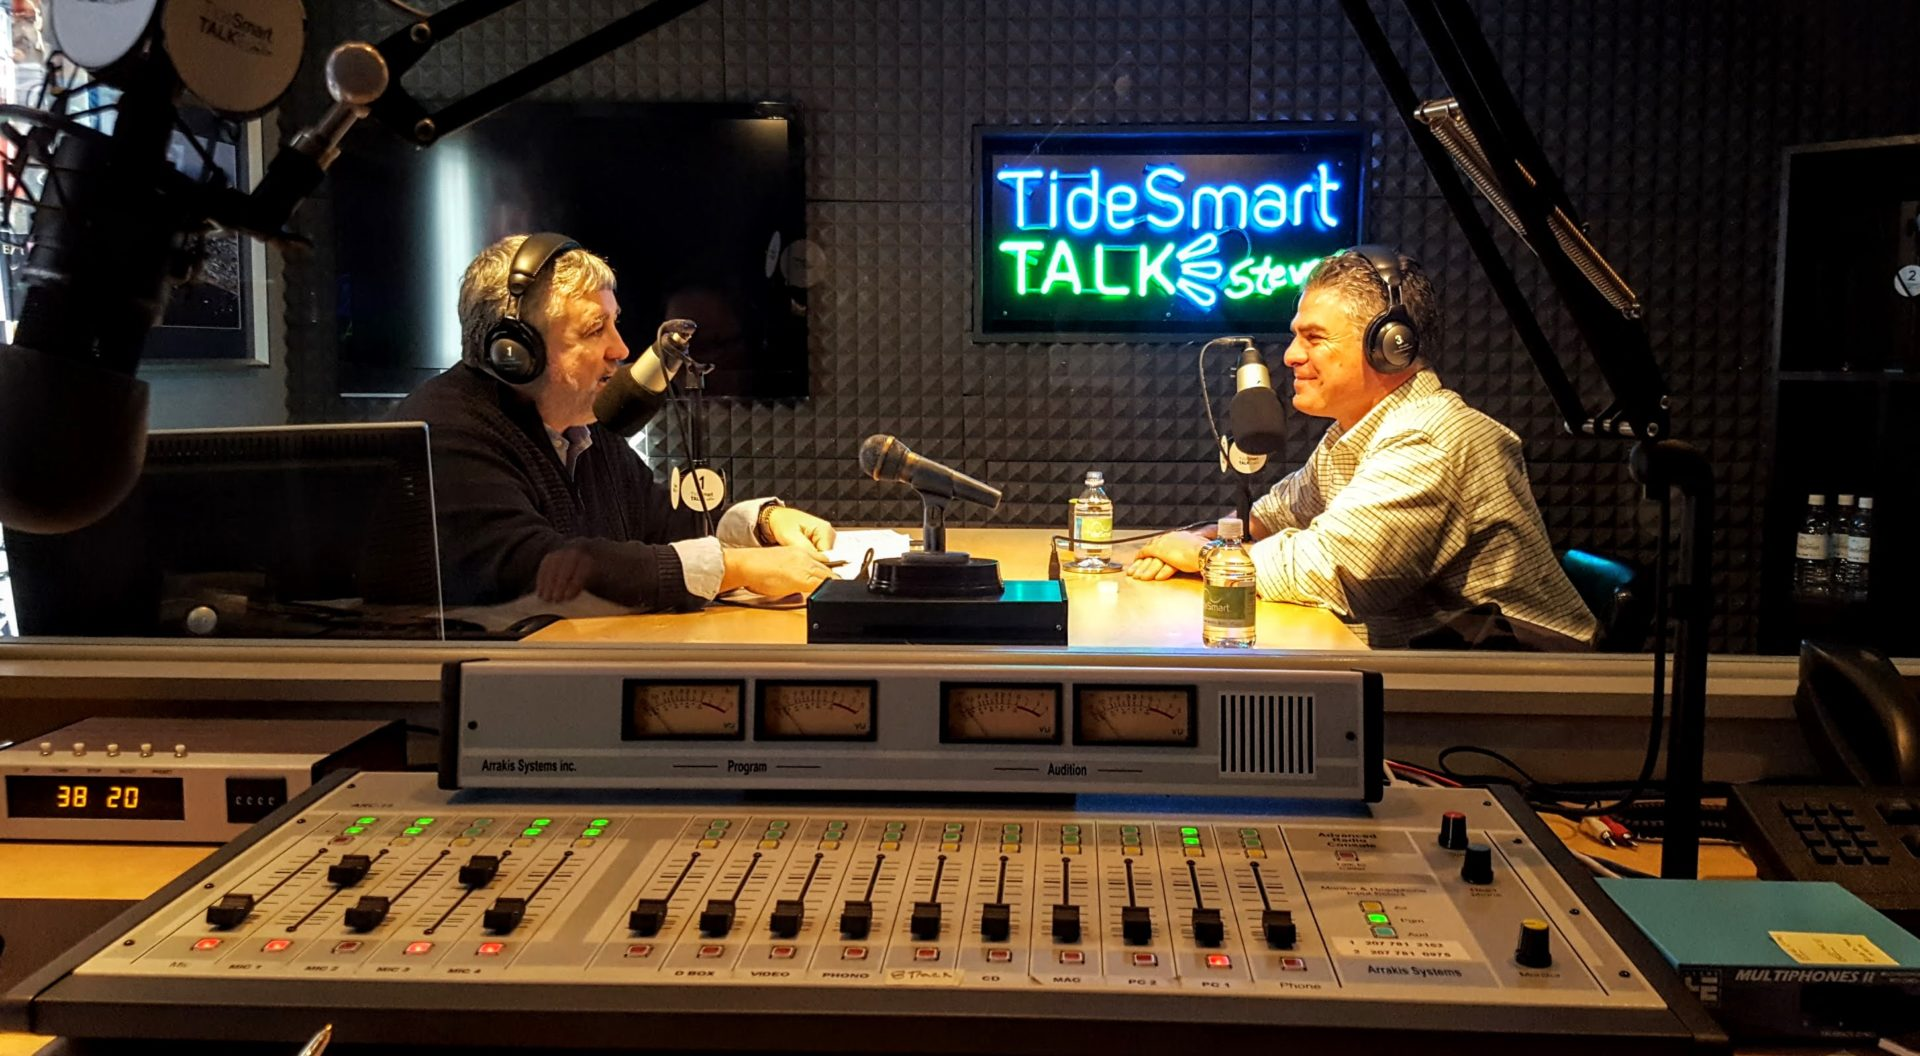 Host of TideSmart Talk with Stevoe, Steve Woods, welcomed Ethan Strimling, Mayor of Portland (at right).